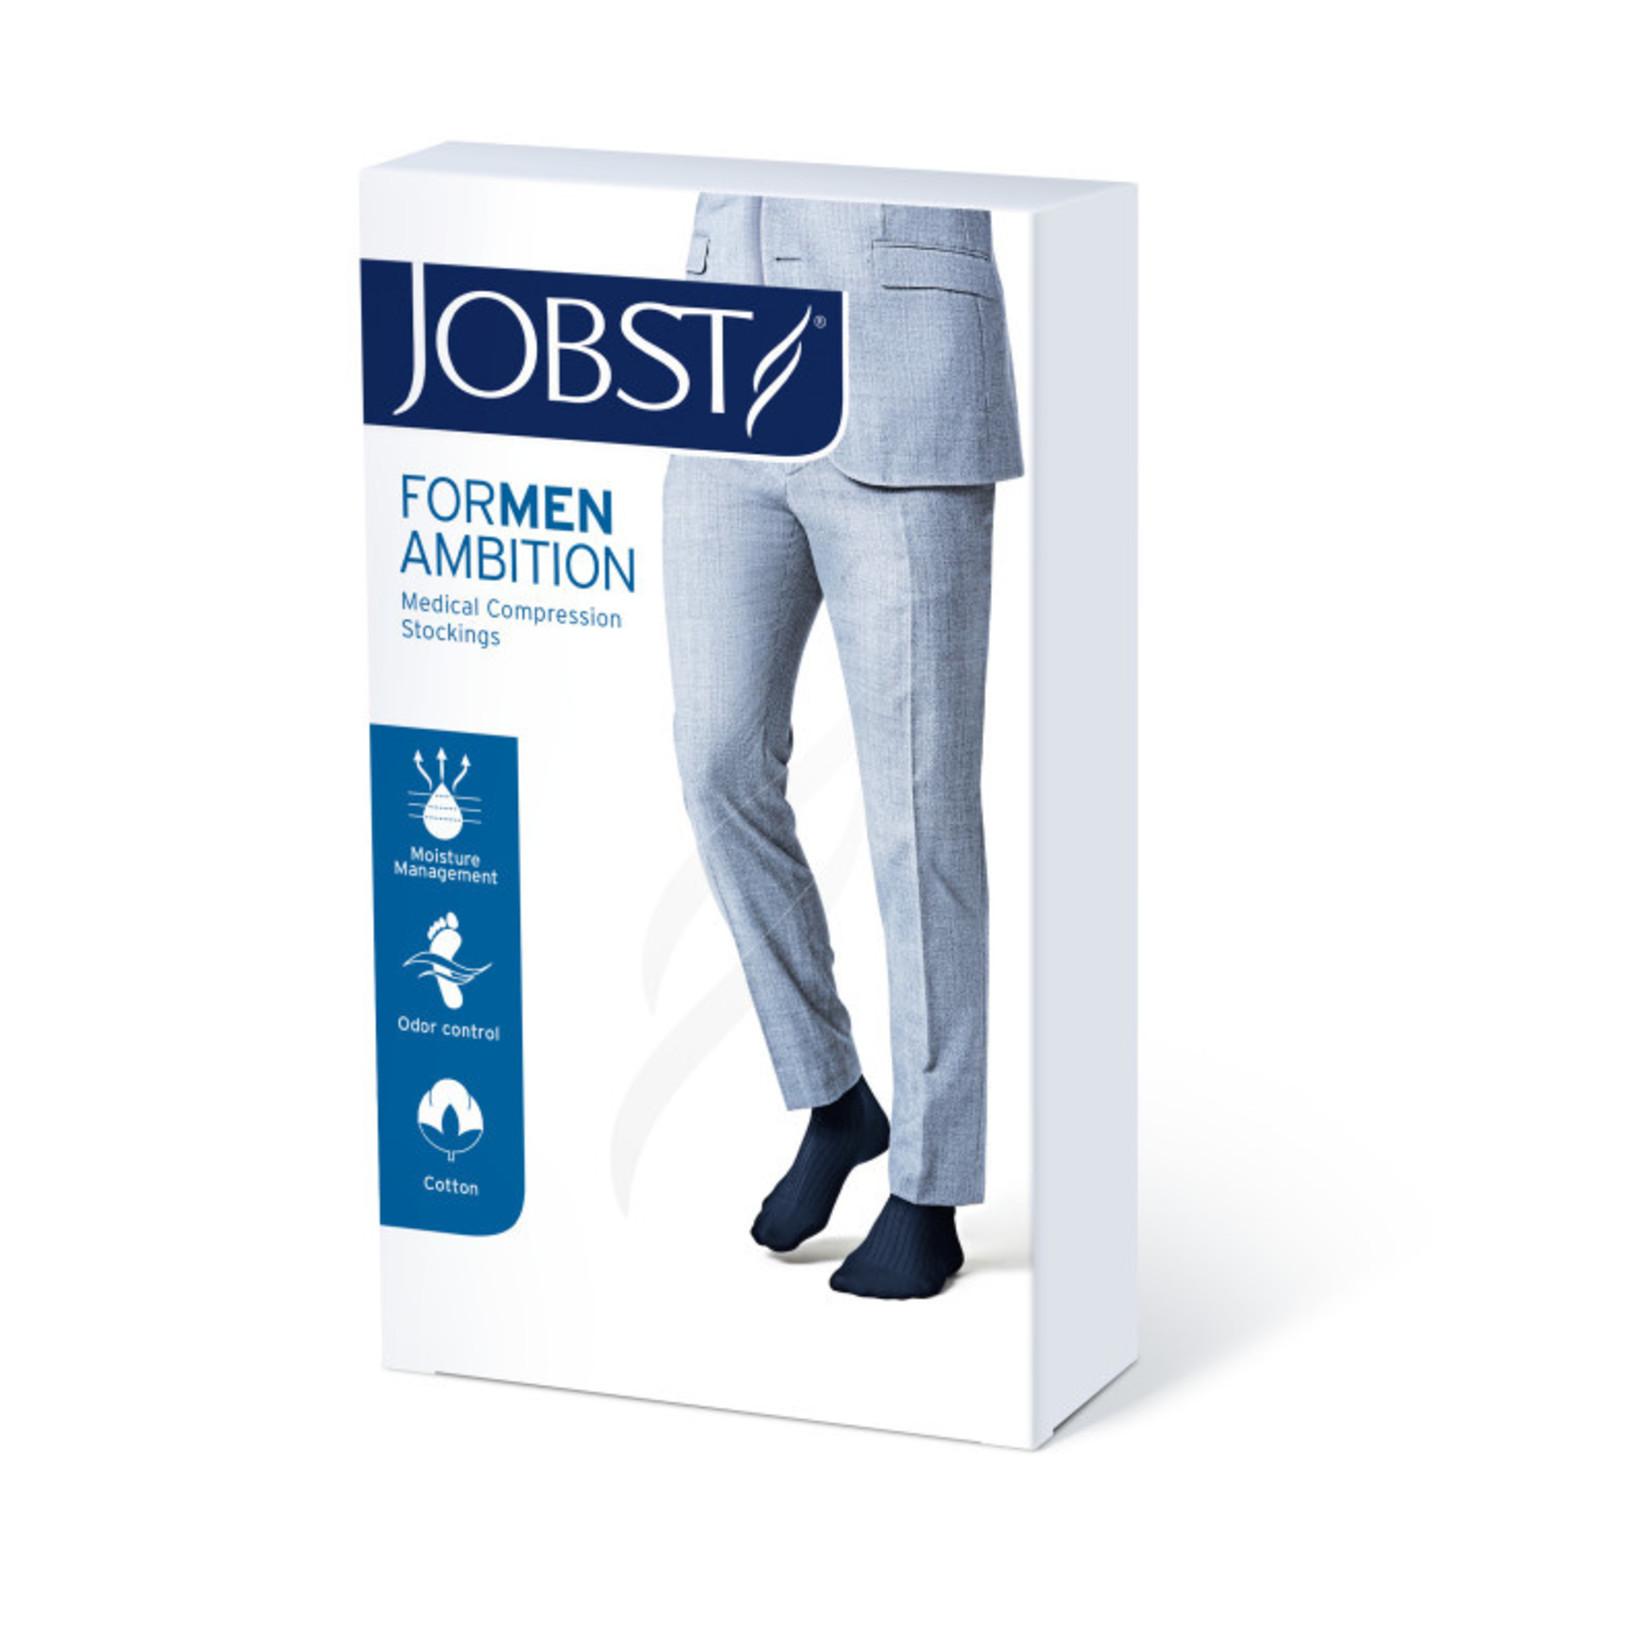 JOBST JOBST FORMEN AMBITION KNEE 20-30 mmHg